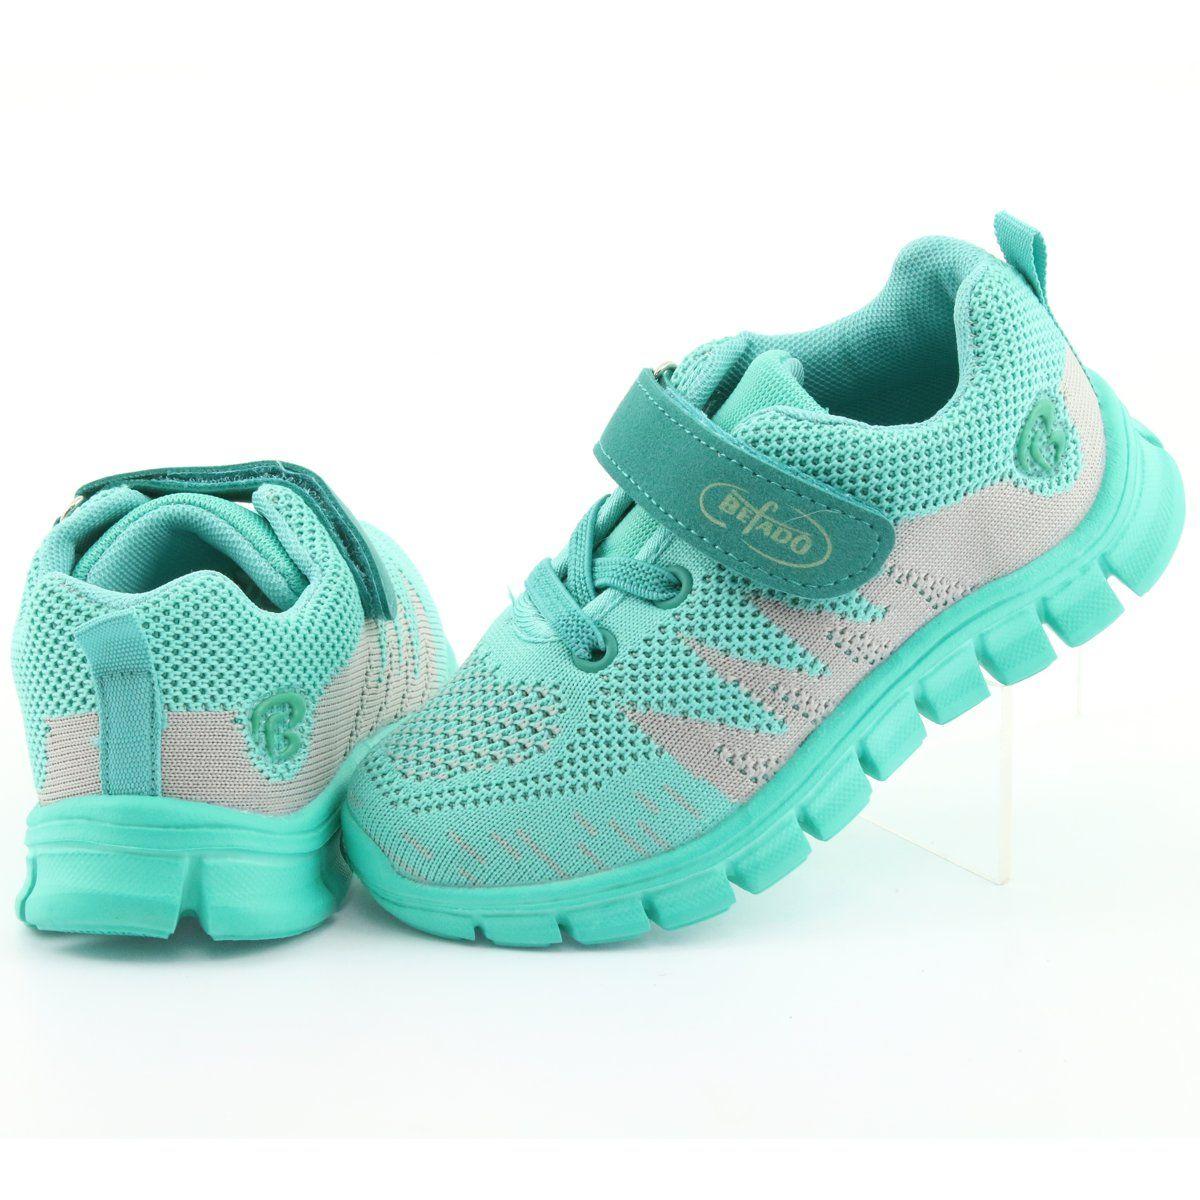 Befado Obuwie Dzieciece Do 23 Cm 516x026 Zielone Baby Shoes Footwear Sketchers Sneakers